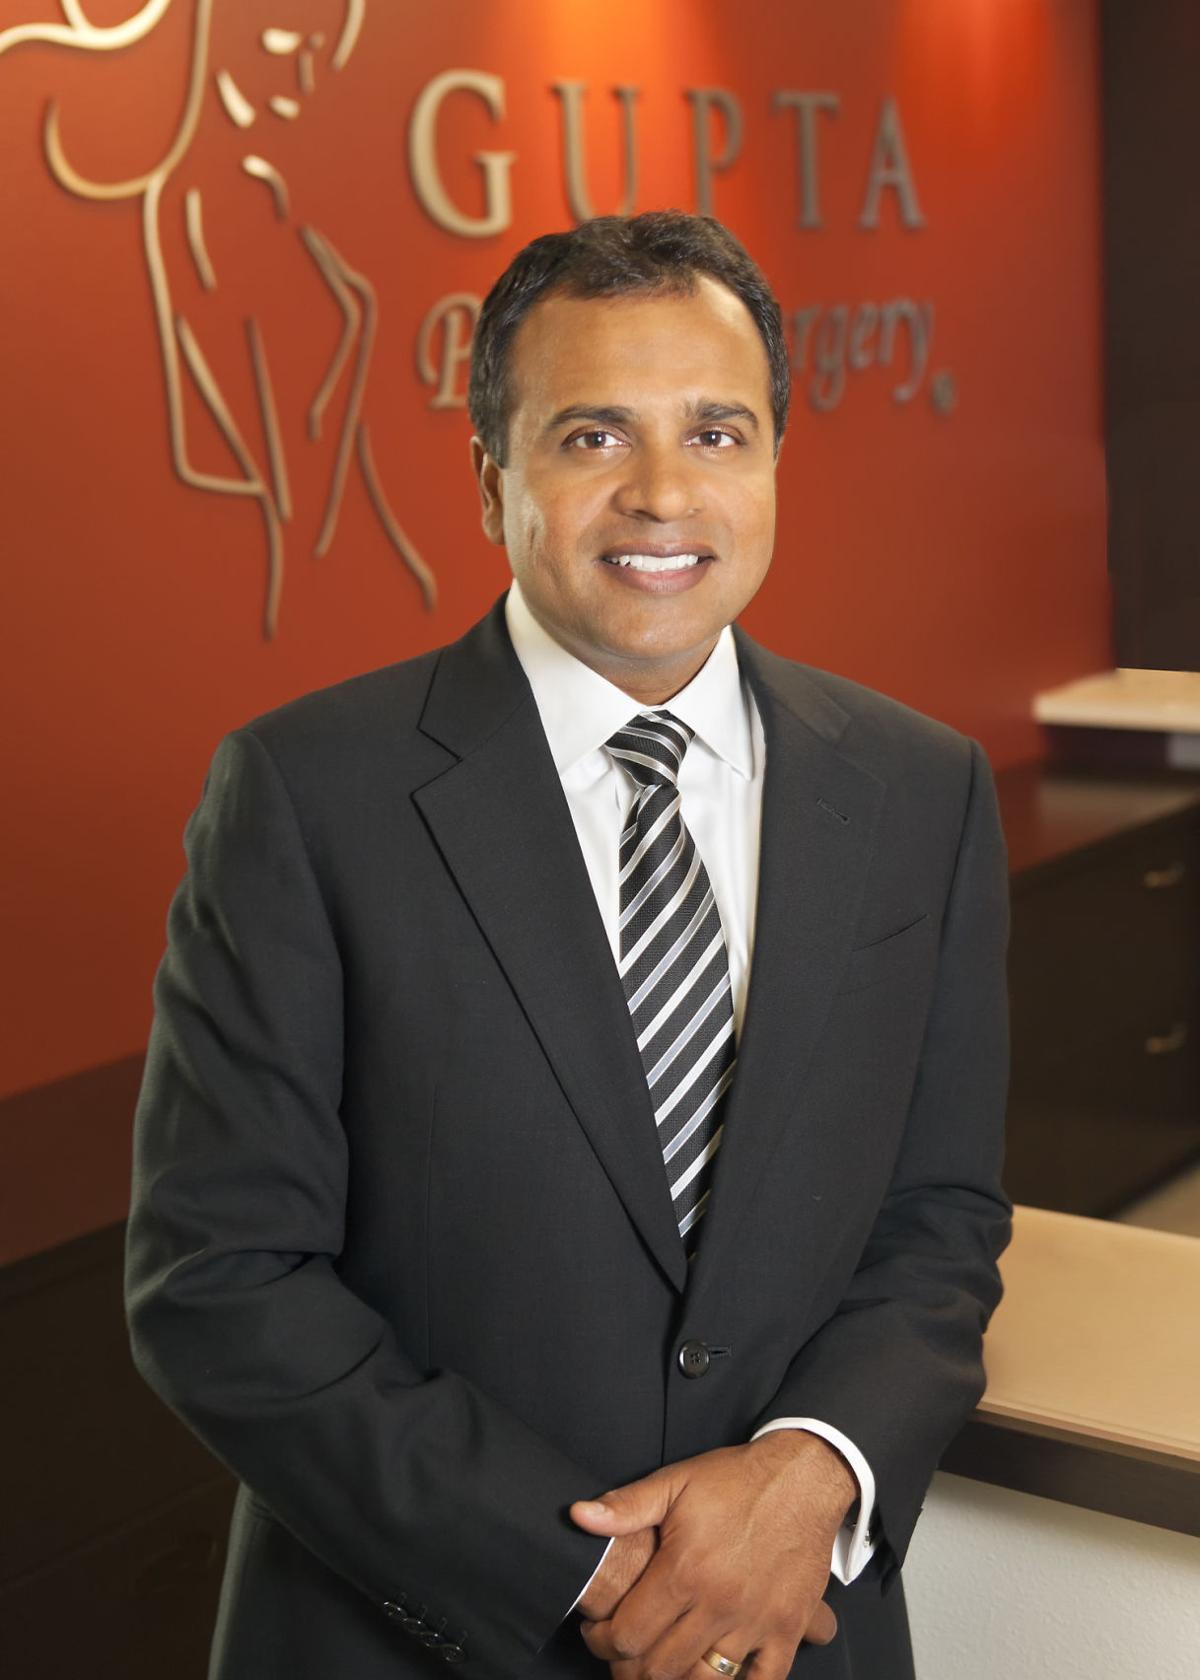 Abhay Gupta, M.D., F.A.C.S.